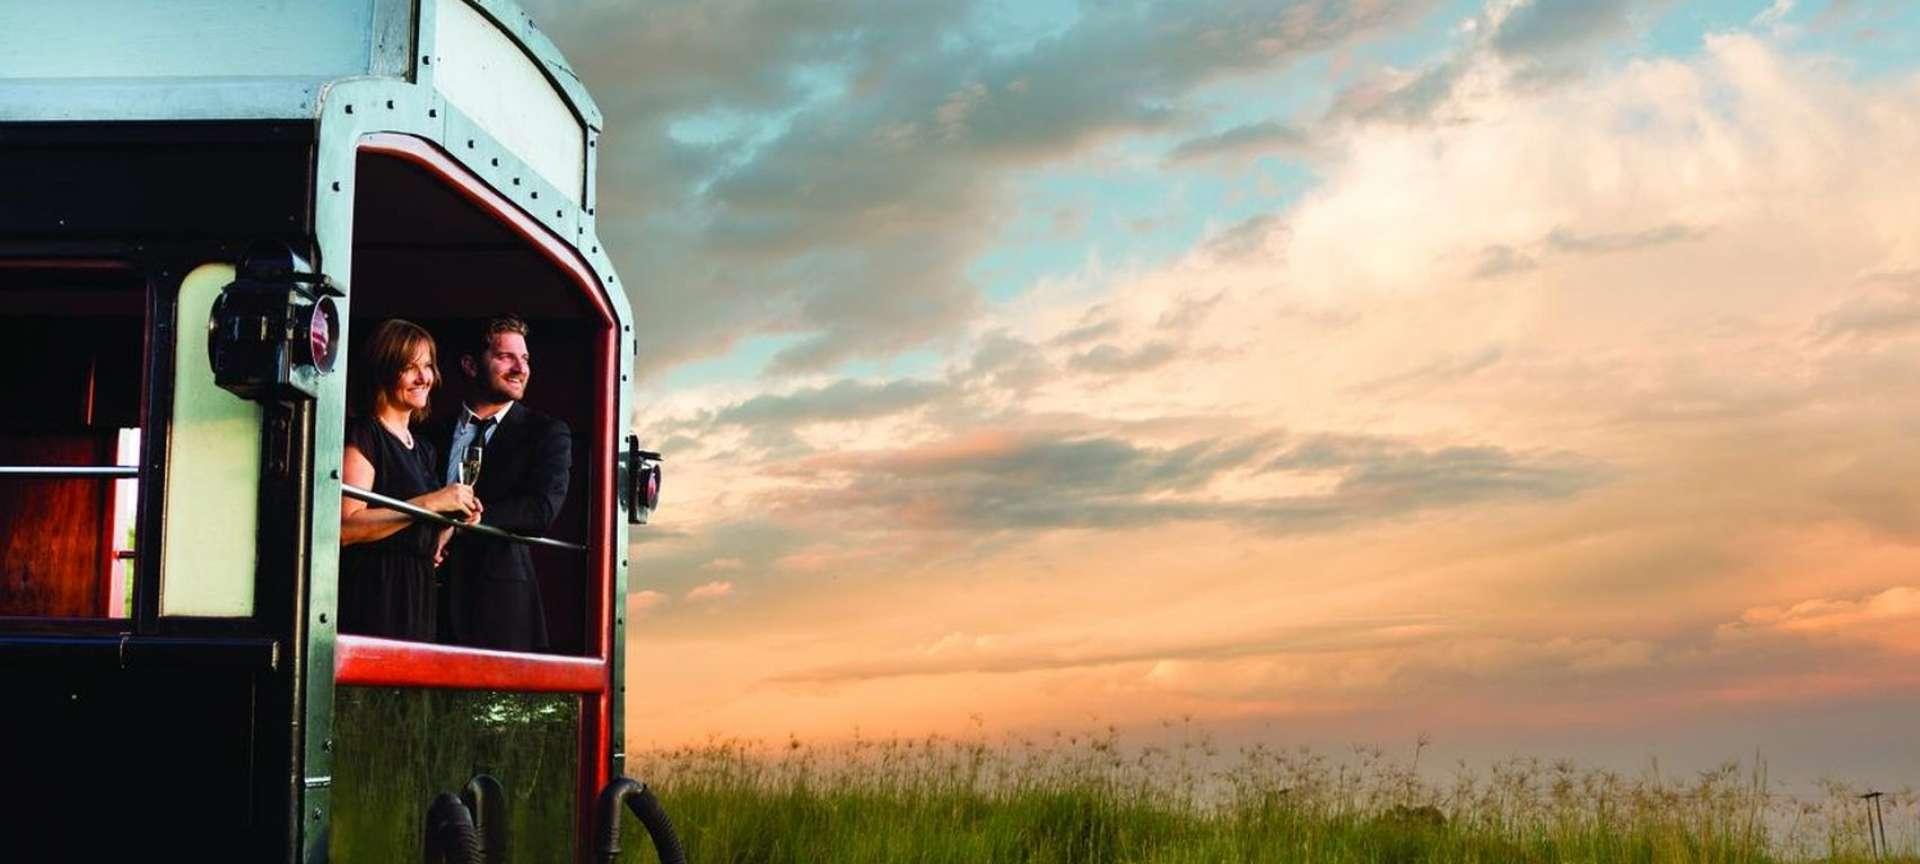 Rail safaris and luxury train travel in Africa - Africa Wildlife Safaris